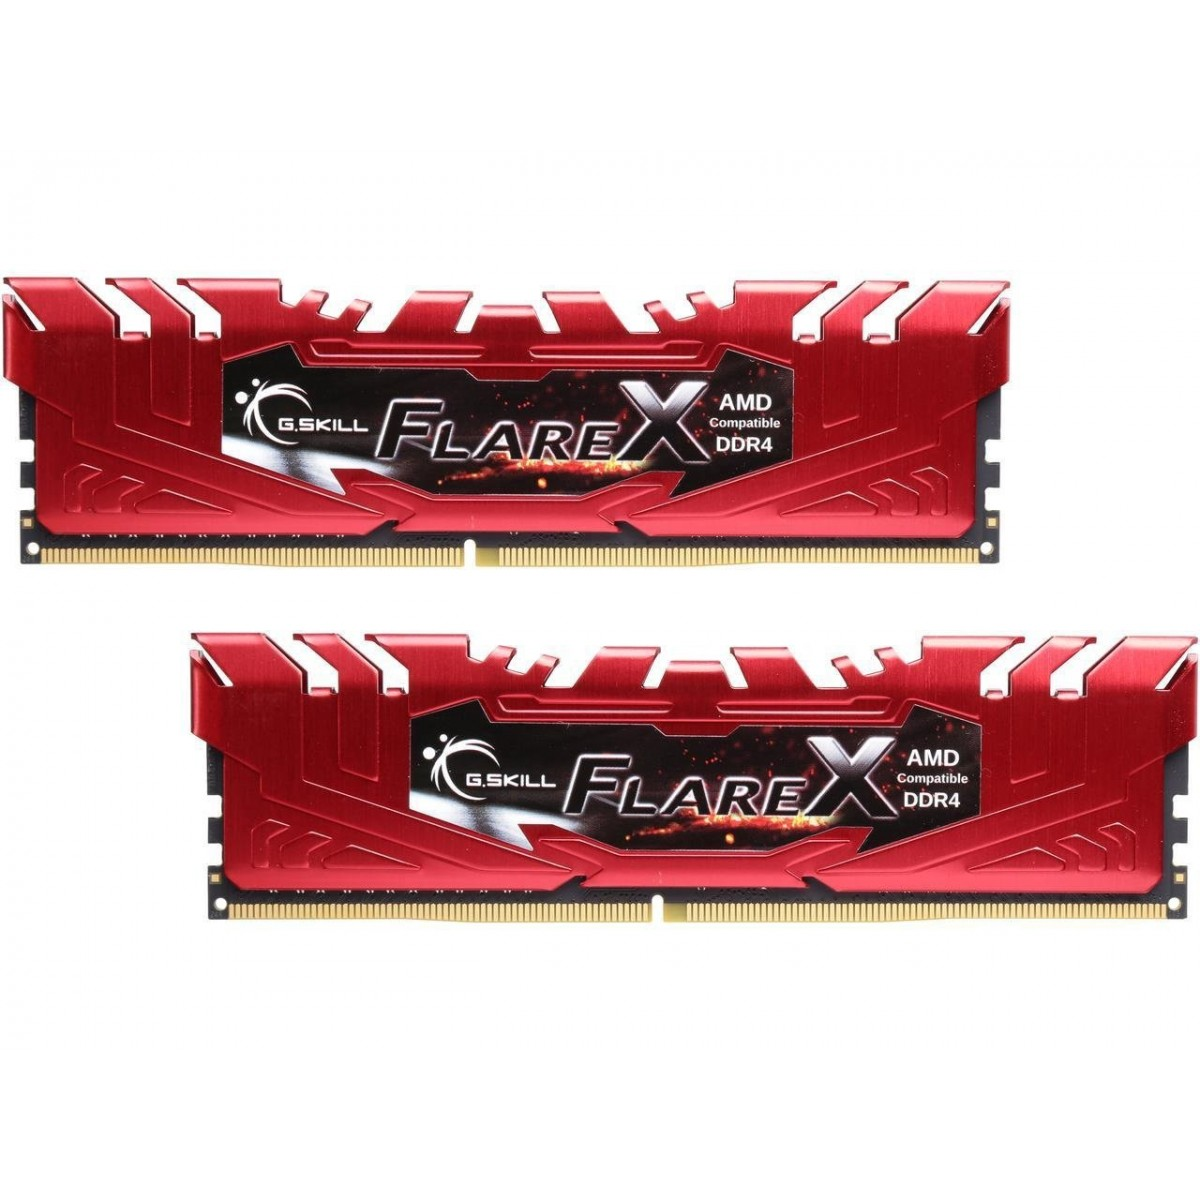 G.SKILL Flare-X 16GB DDR-4 2400MHz (8GBX2) Kit Memory (AMD RYZEN)